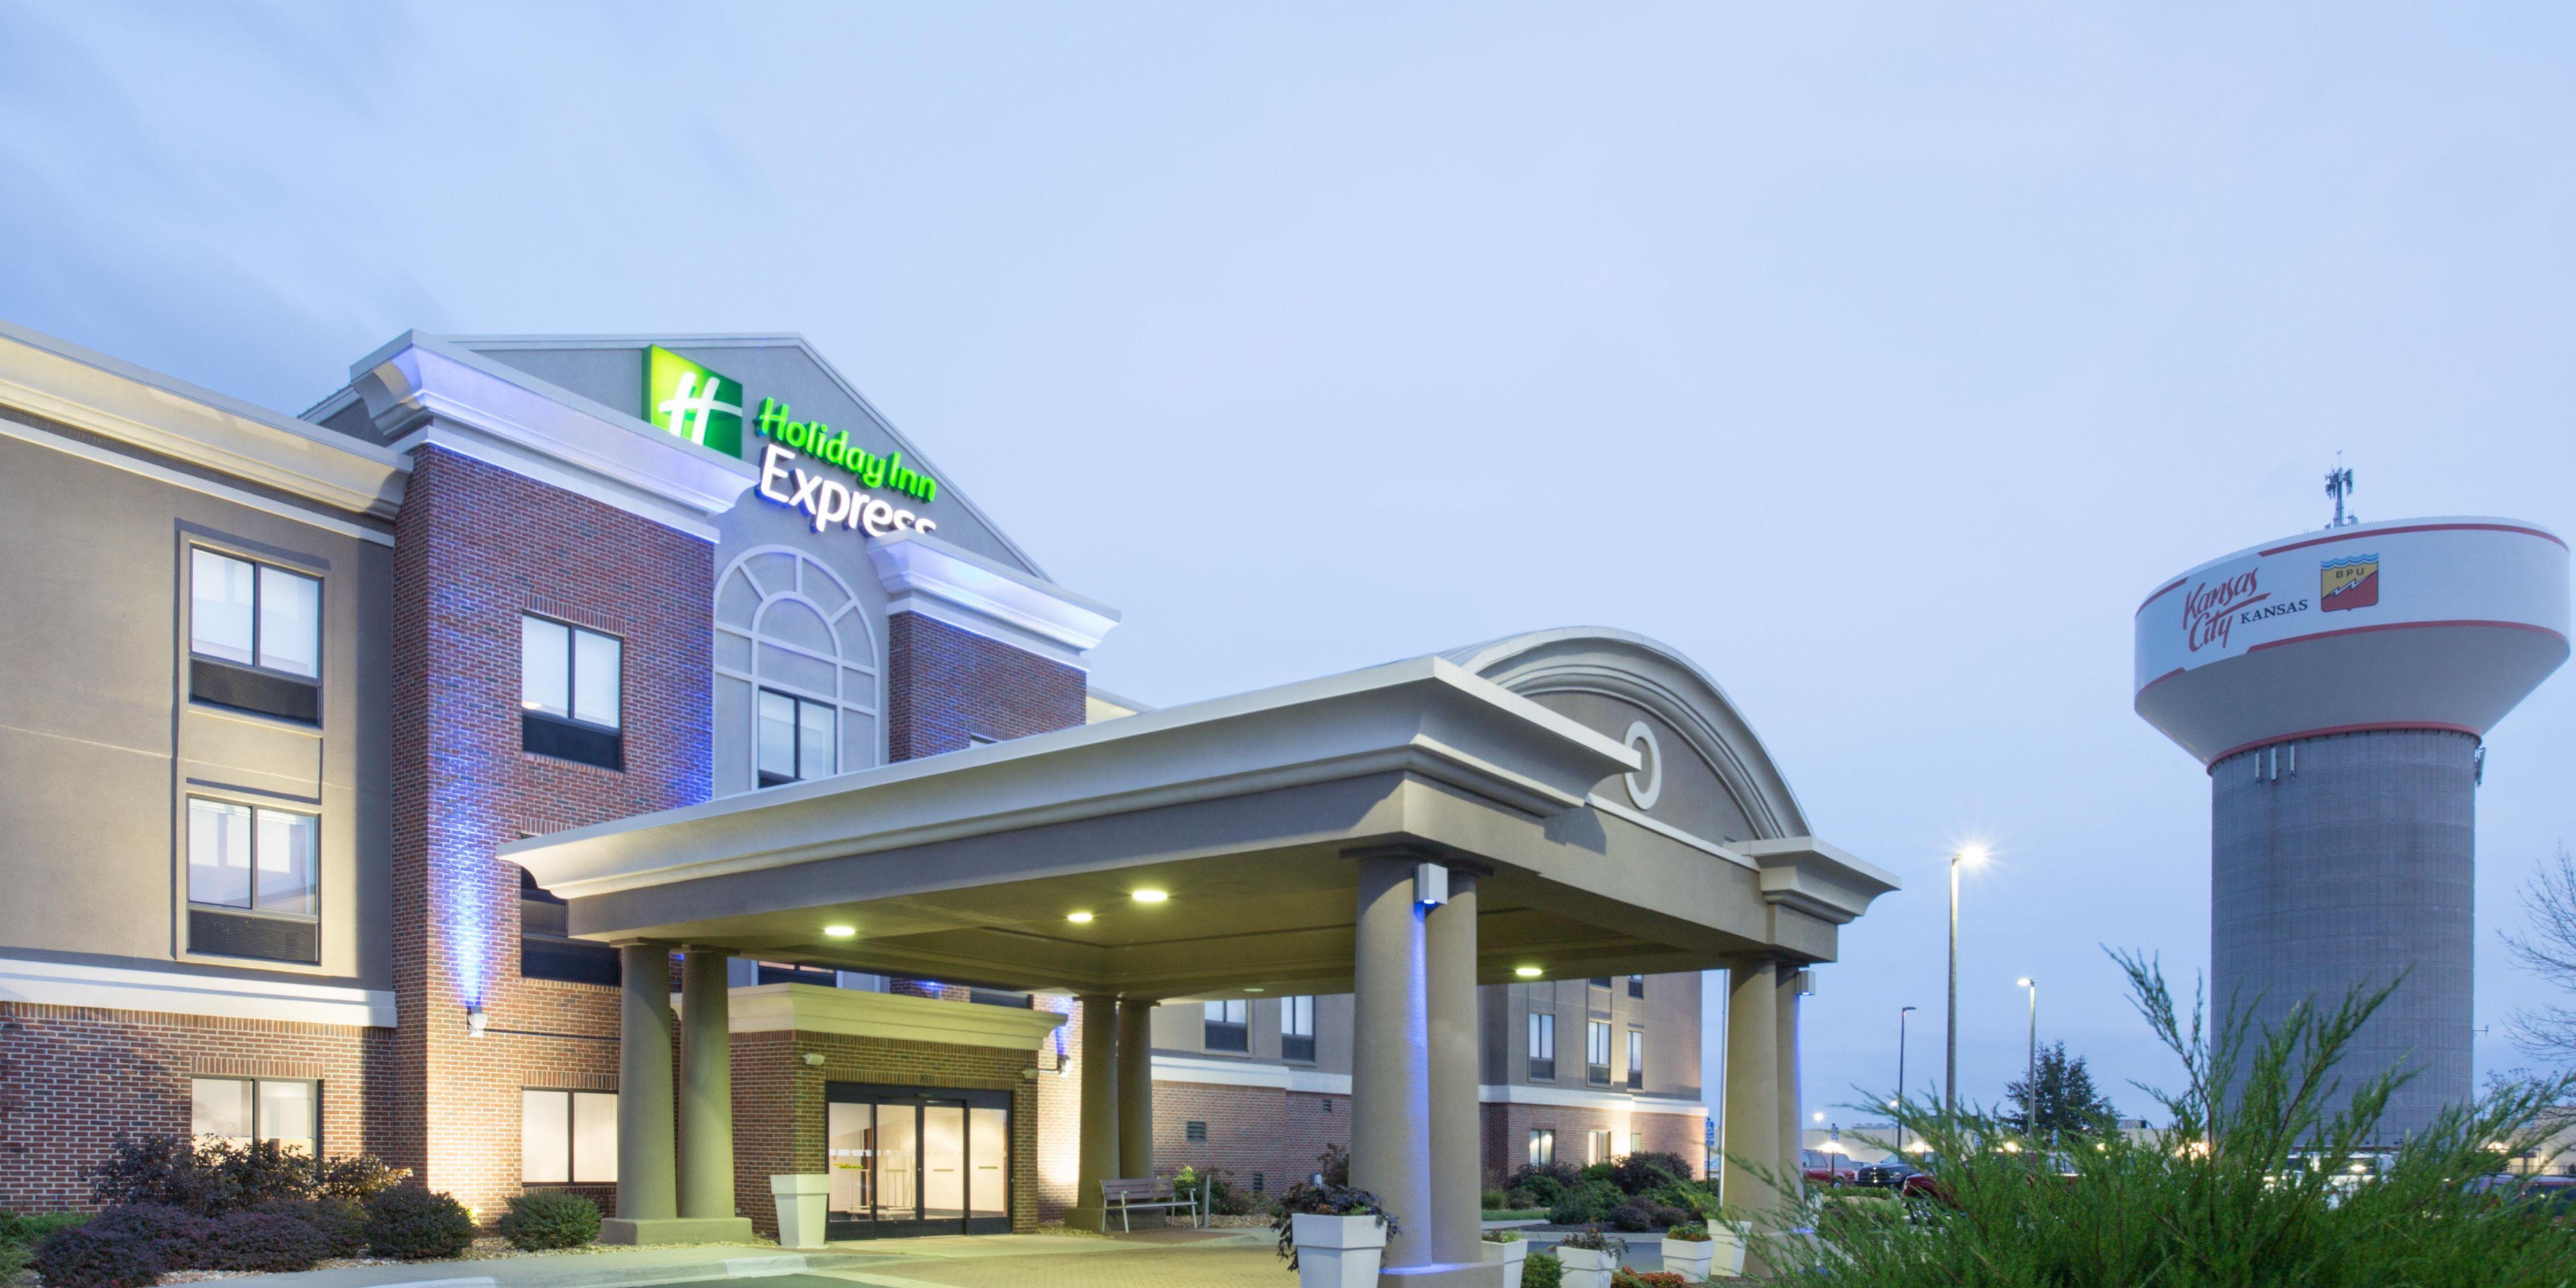 Holiday Inn Express Kansas City 4858473131 2x1